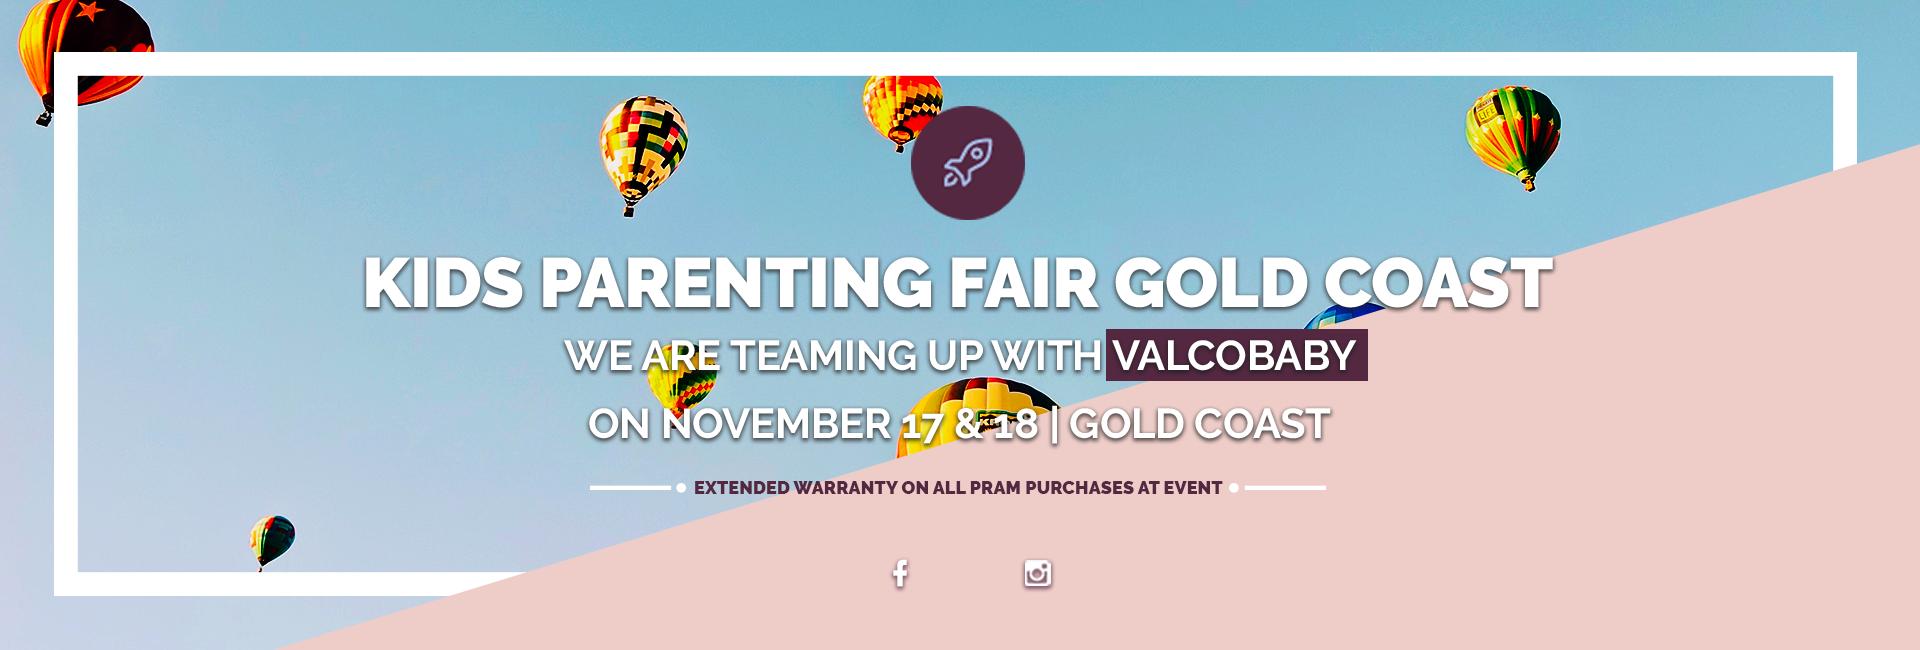 Kids Parenting Fair Gold Coast 2018 Parenting Fair Gold Coast with Valcobaby 2018